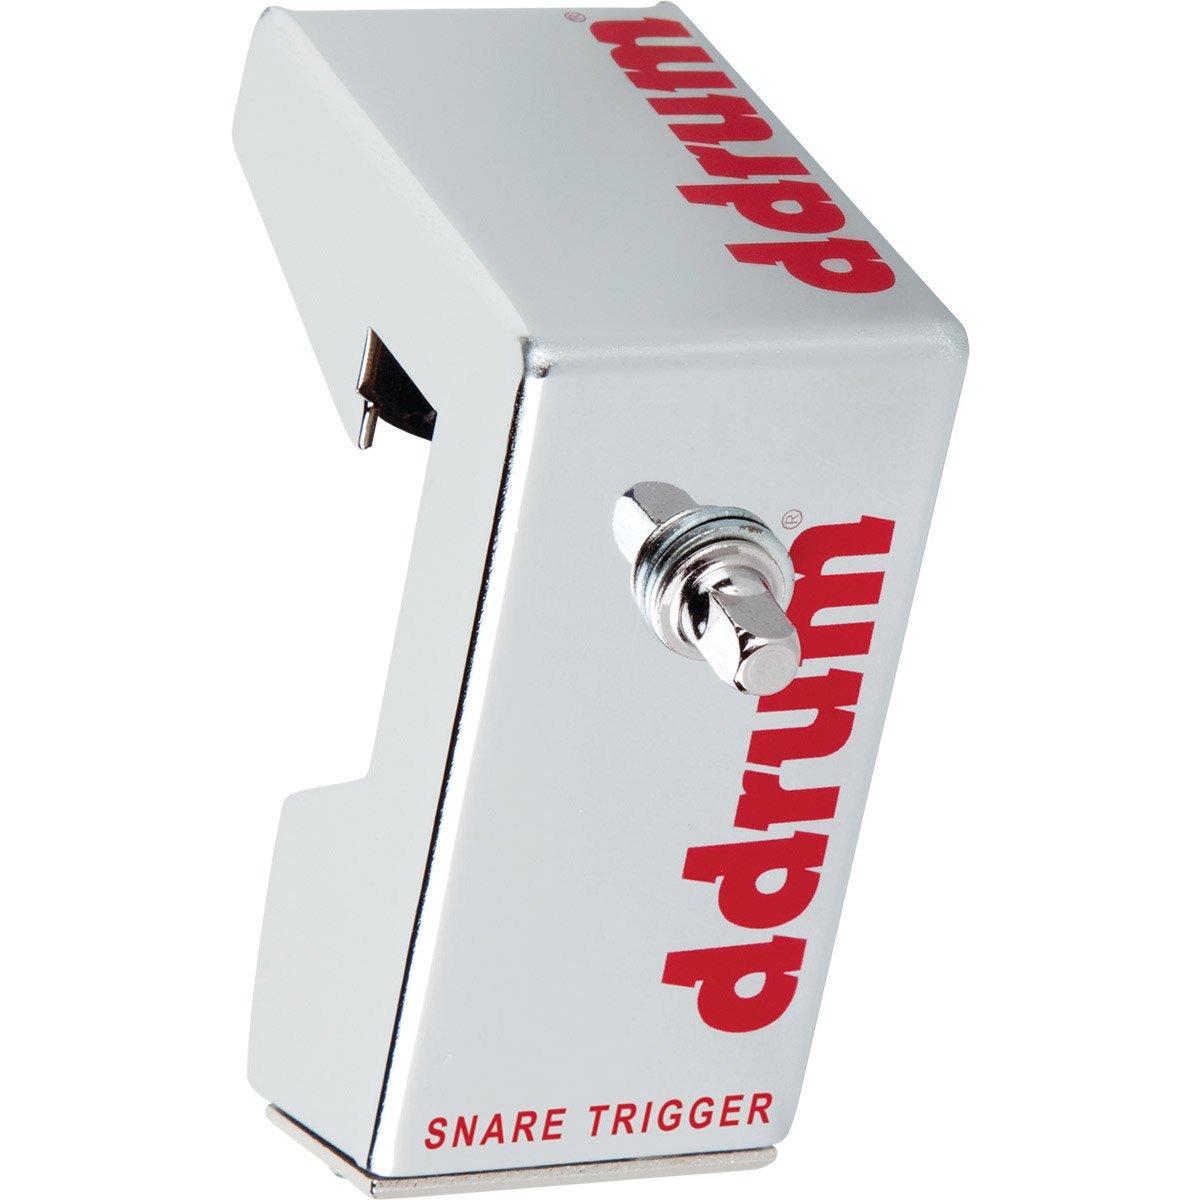 ddrum Chrome Elite Snare Drum Trigger スネアドラムトリガー   B00B7MY0T2